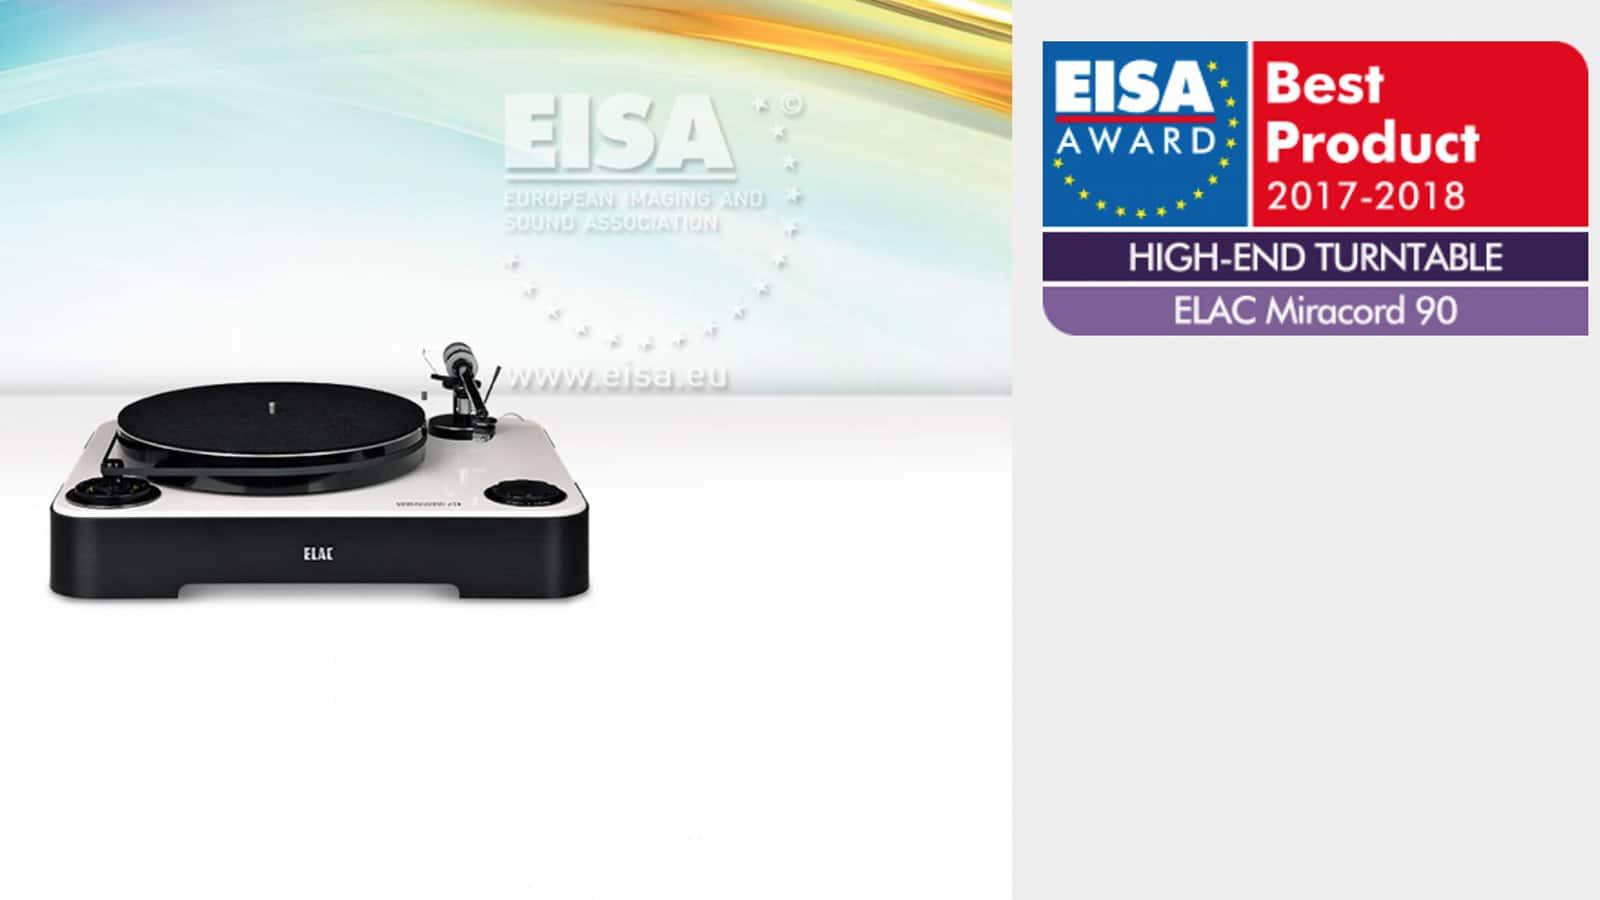 elac-miracord-90-wins-eisa-award